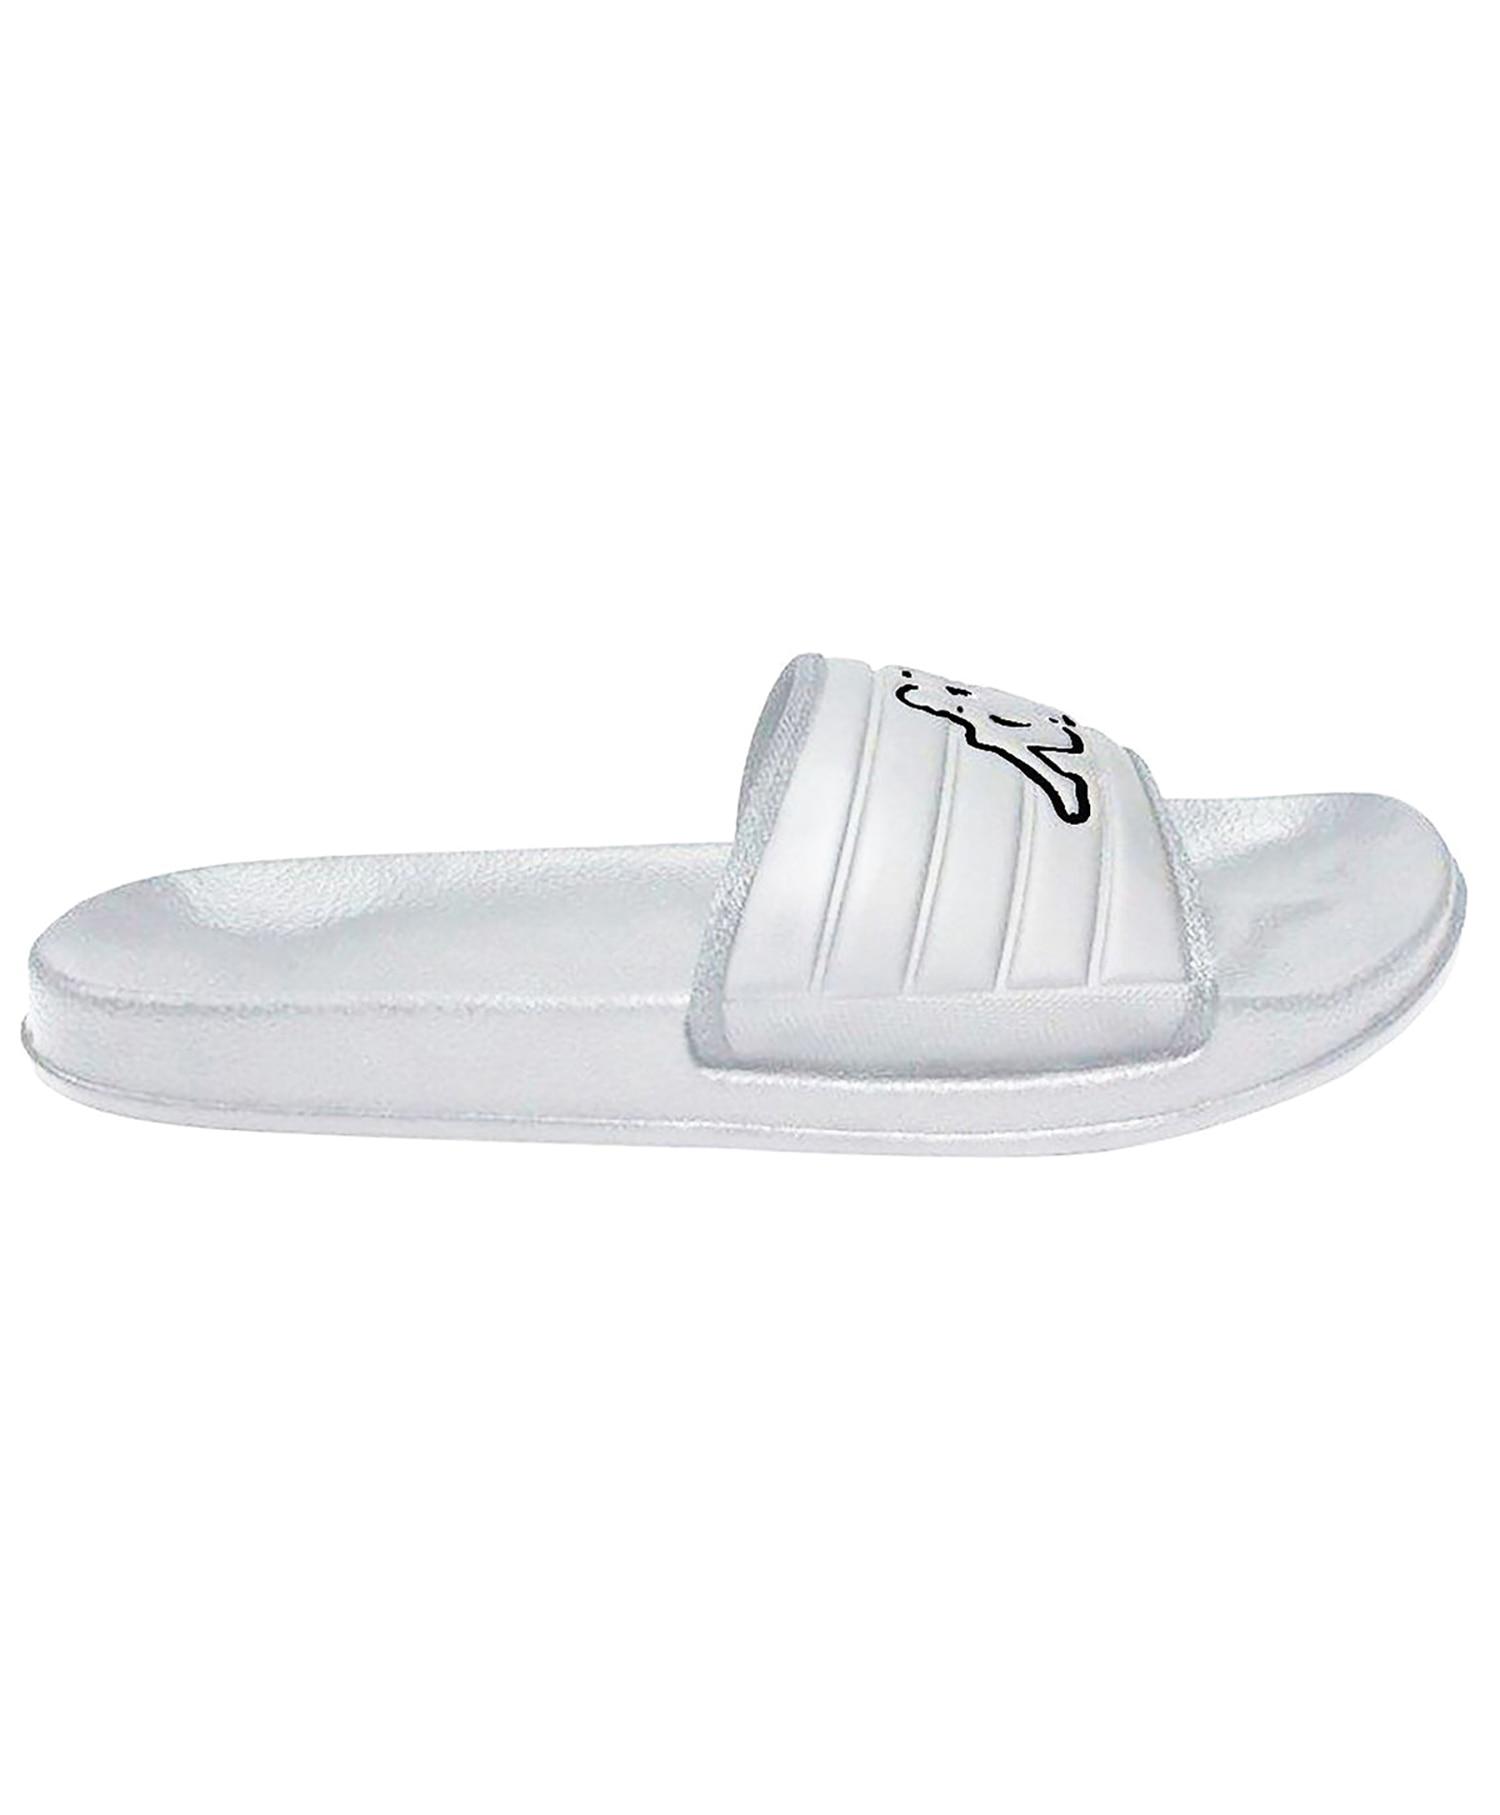 Kappa Lablo slippers dame